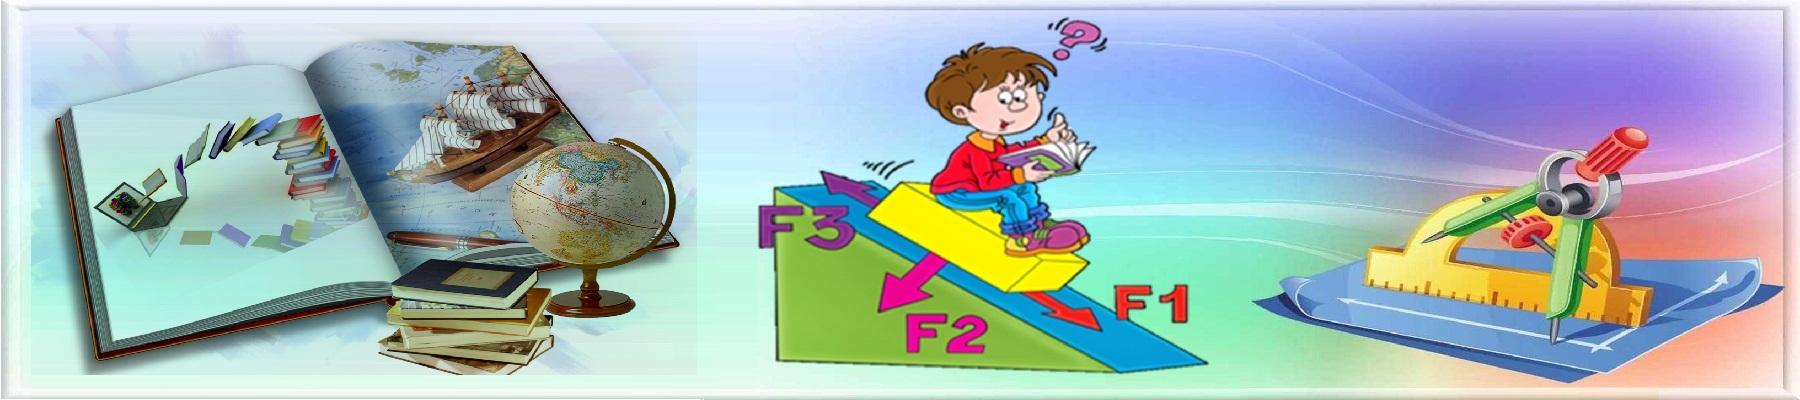 Сайт учителя физики и математики